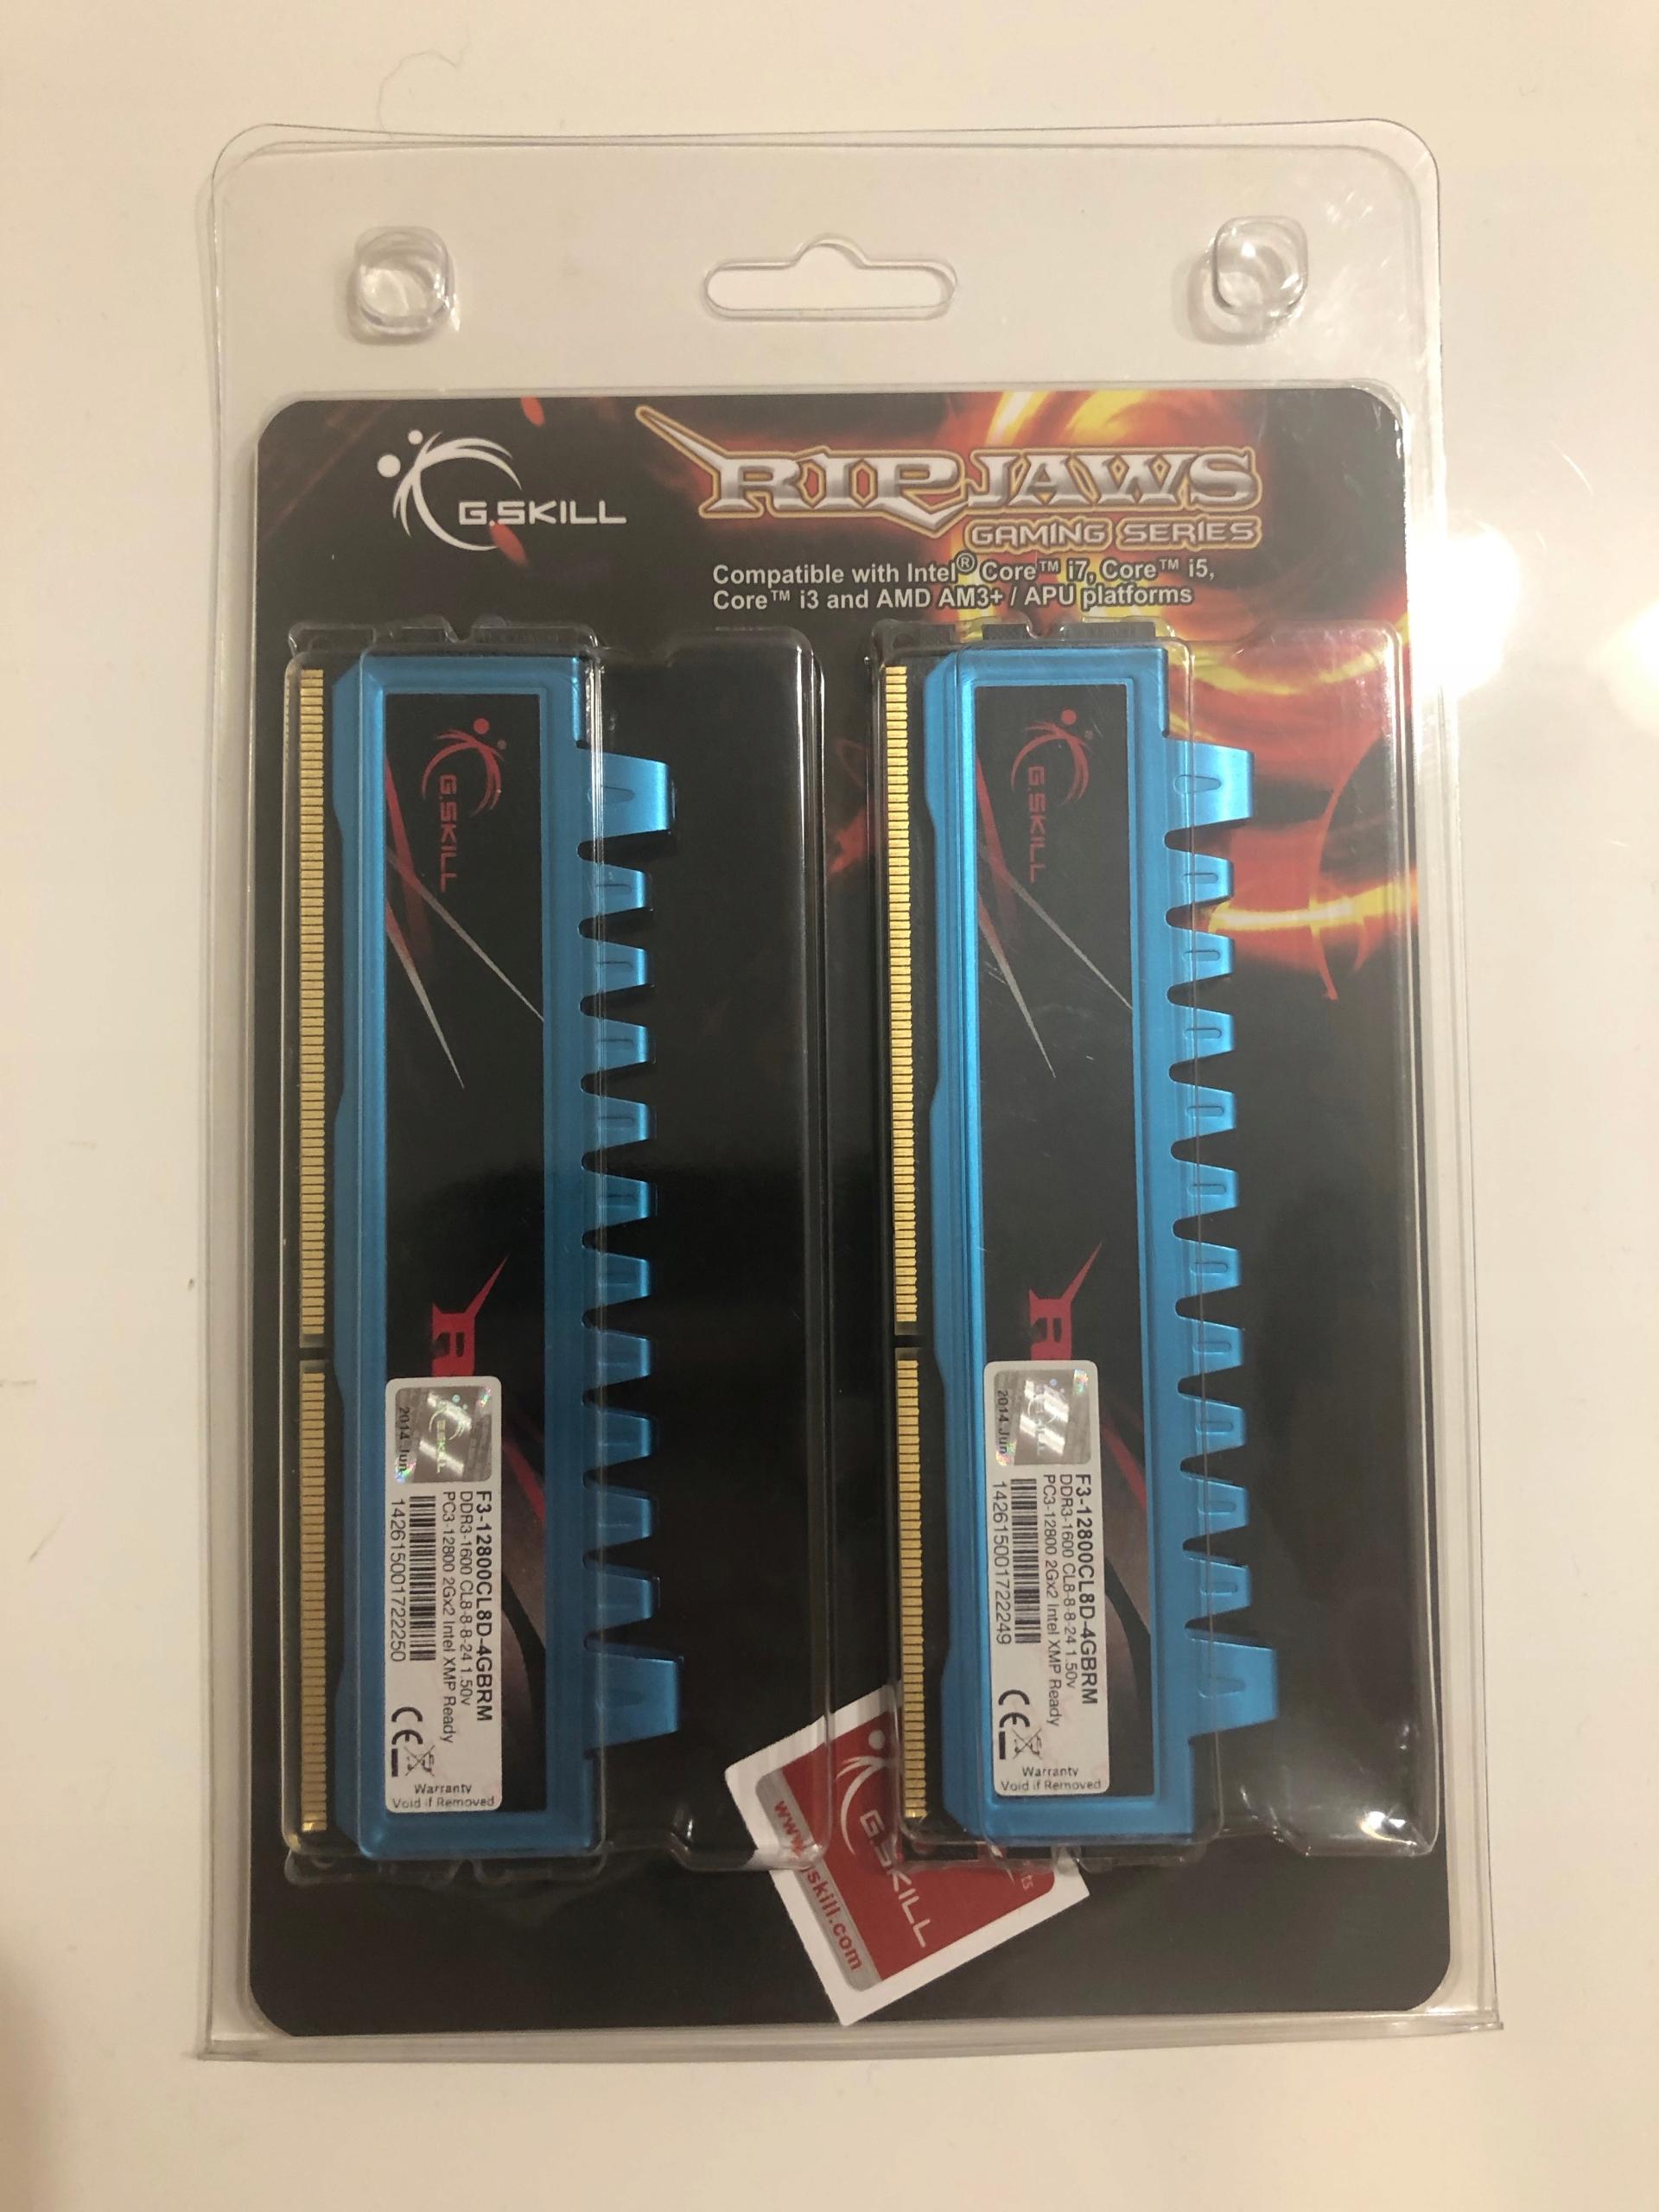 G.Skill Ripjaws 4GB (2x2GB) DDR3 RAM 1600MHz CL8